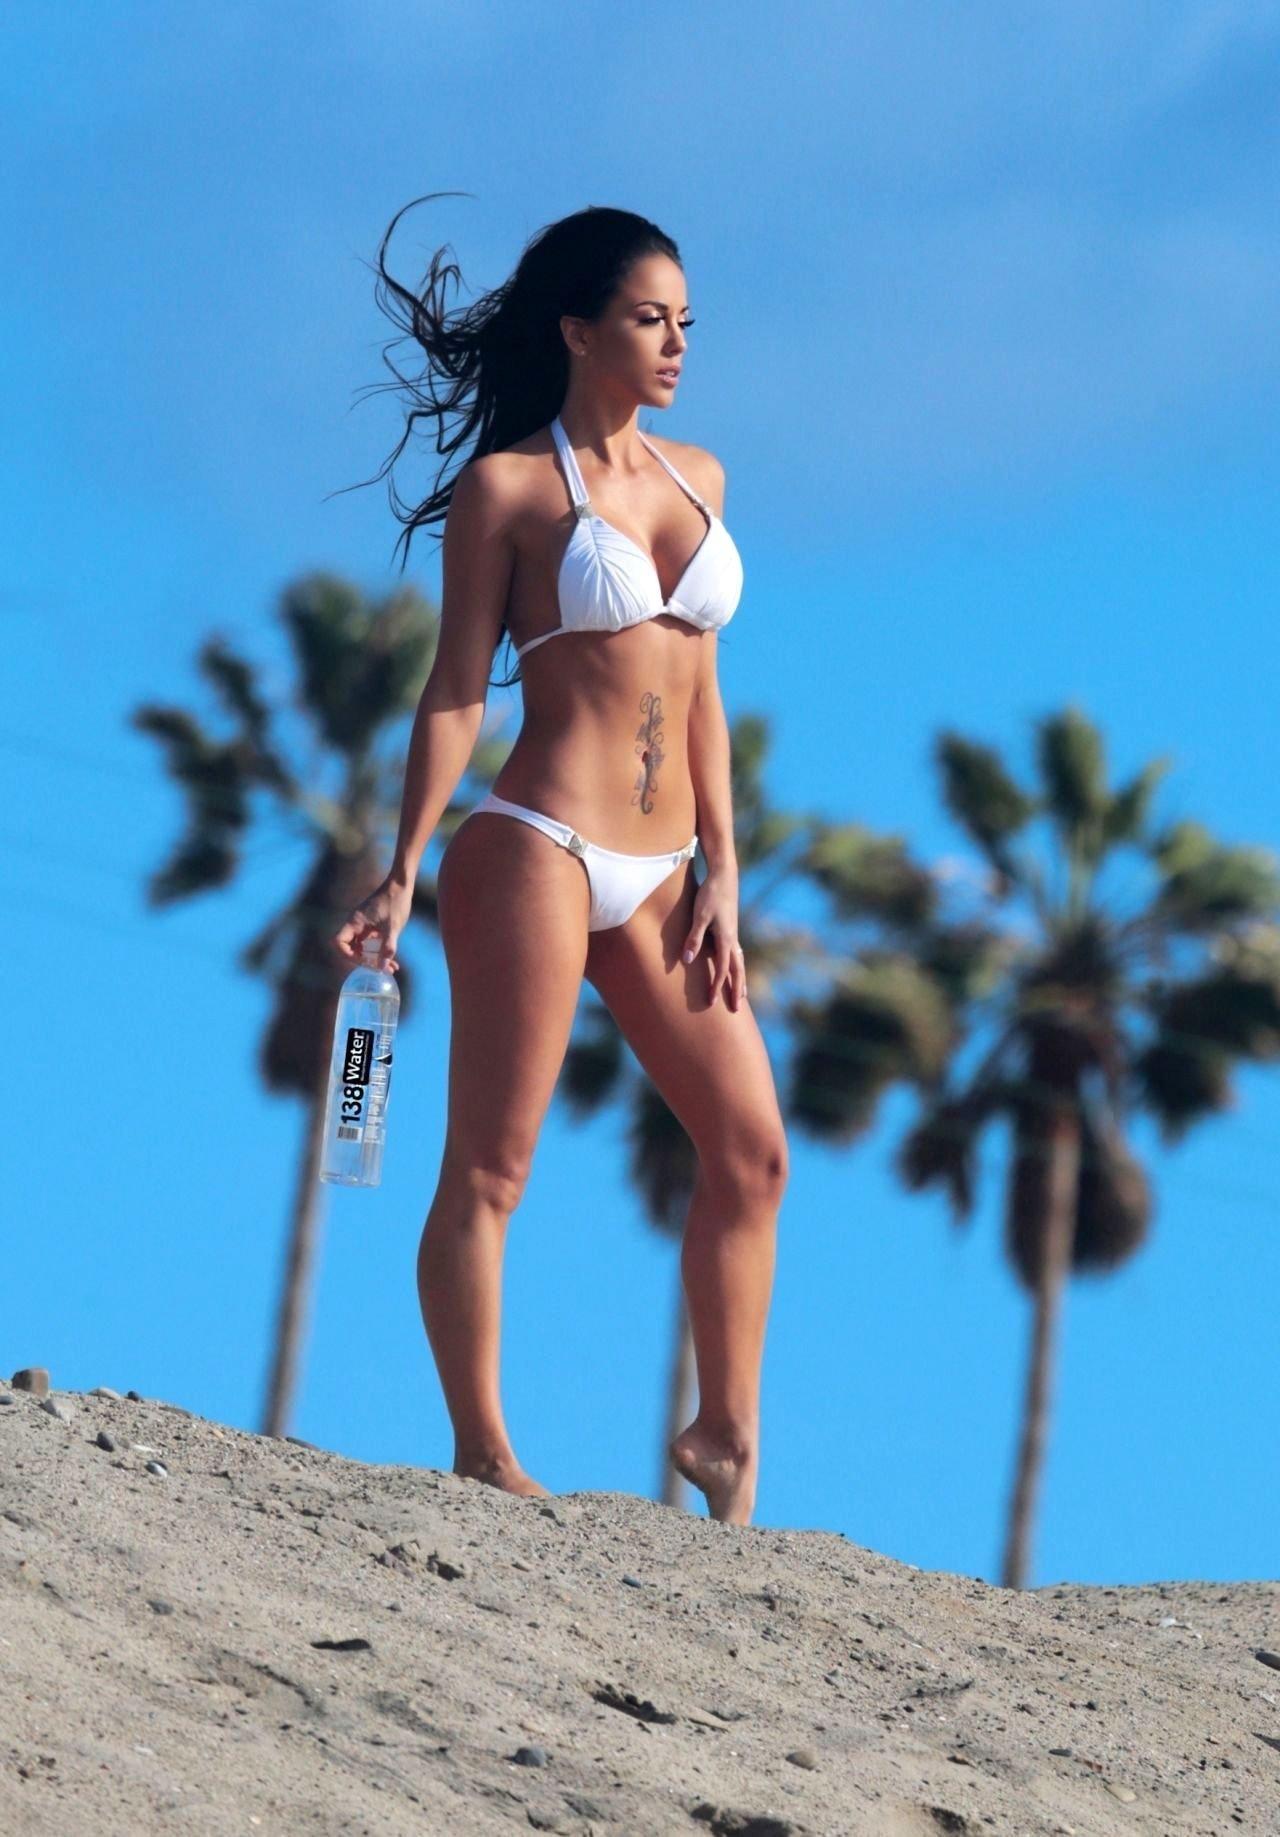 Melissa riso flaunts her bikini body nudes (13 photo)